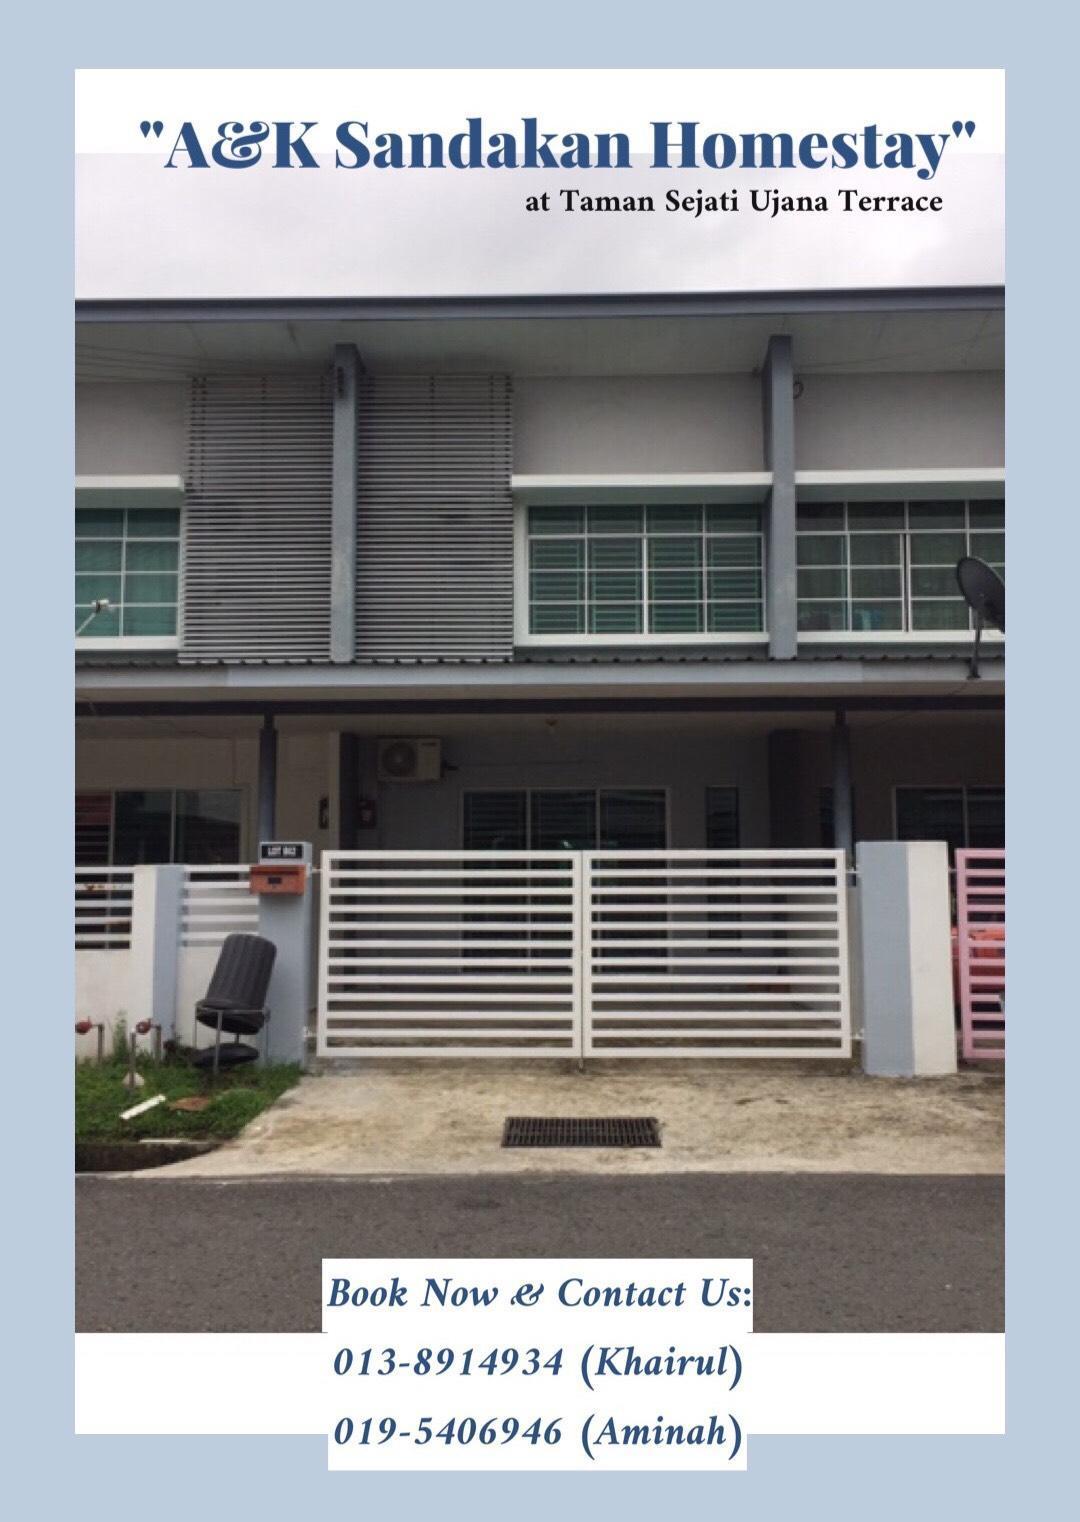 A&K Homestay Sandakan,Sabah